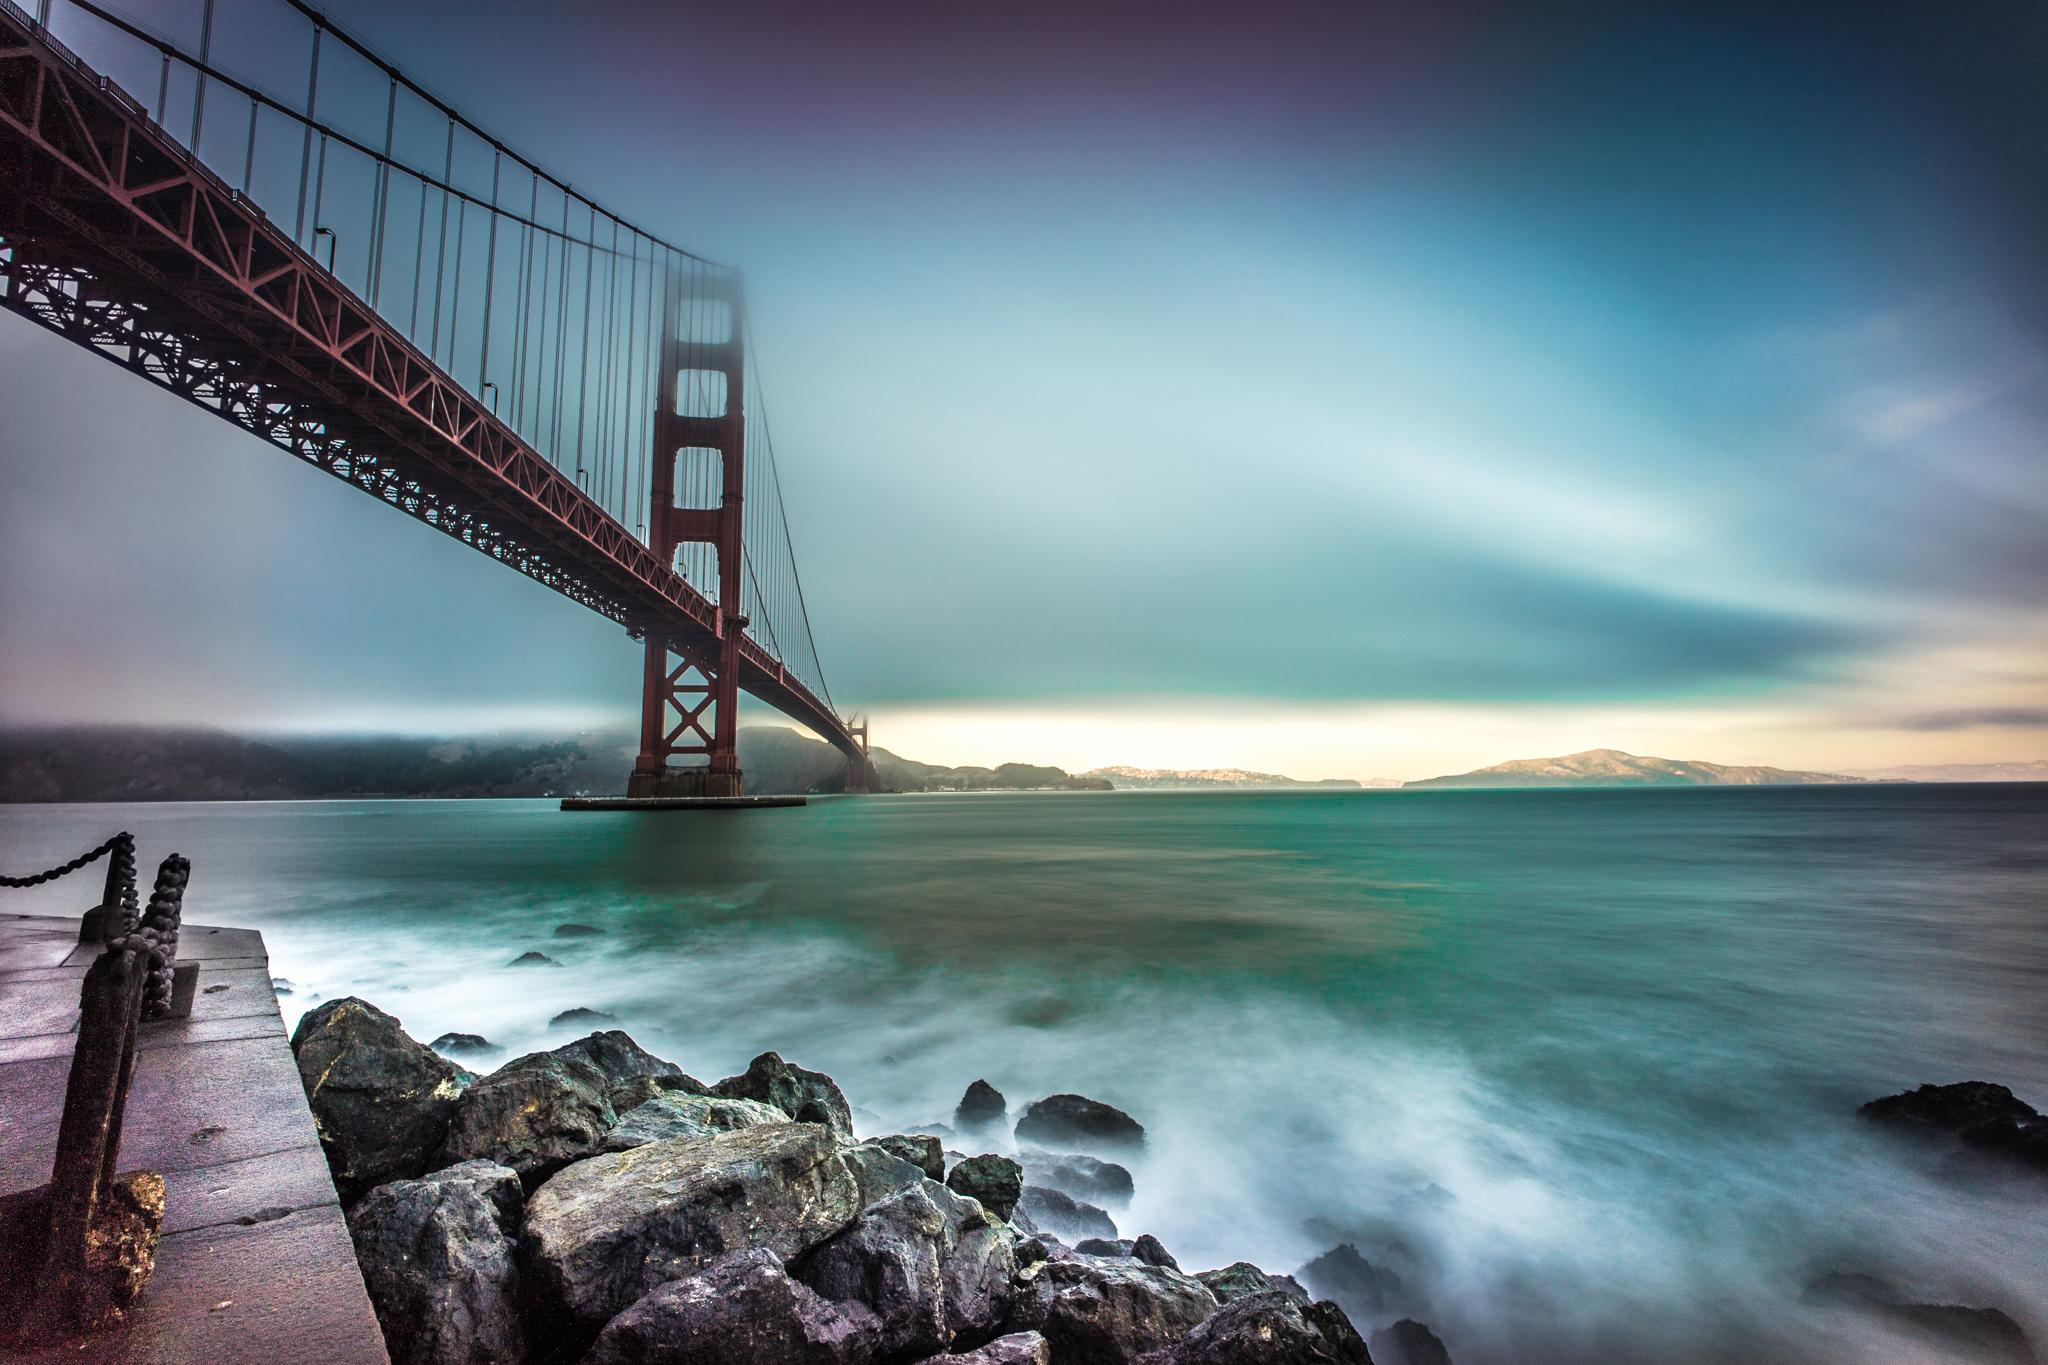 Dating sites in Monterey California LatinoMeetup